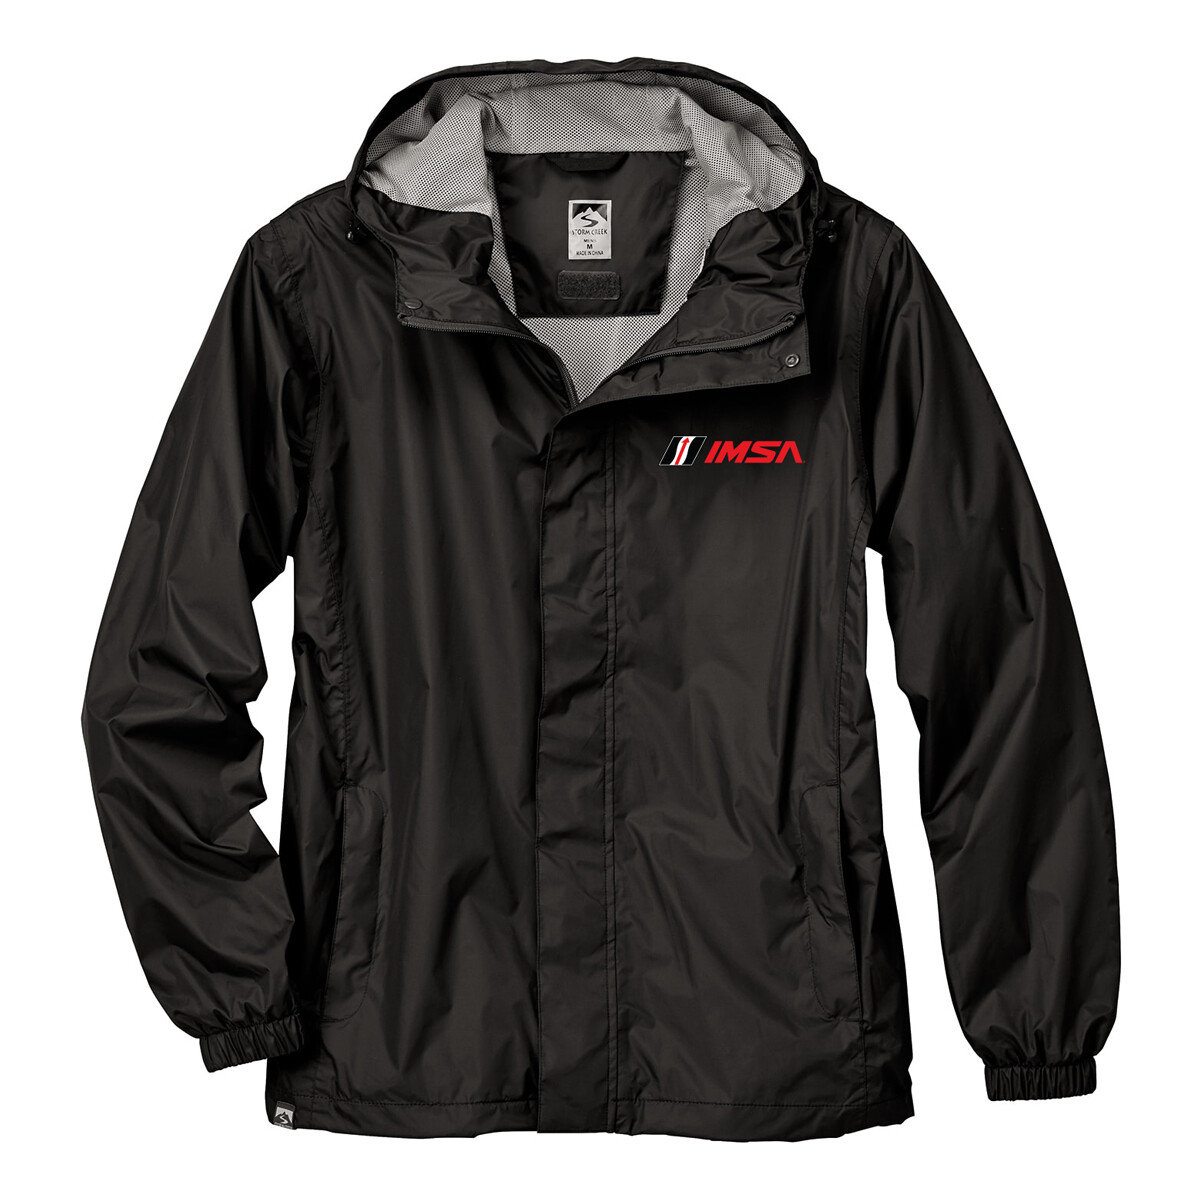 IMSA Waterproof Rain Jacket - Black/Grey